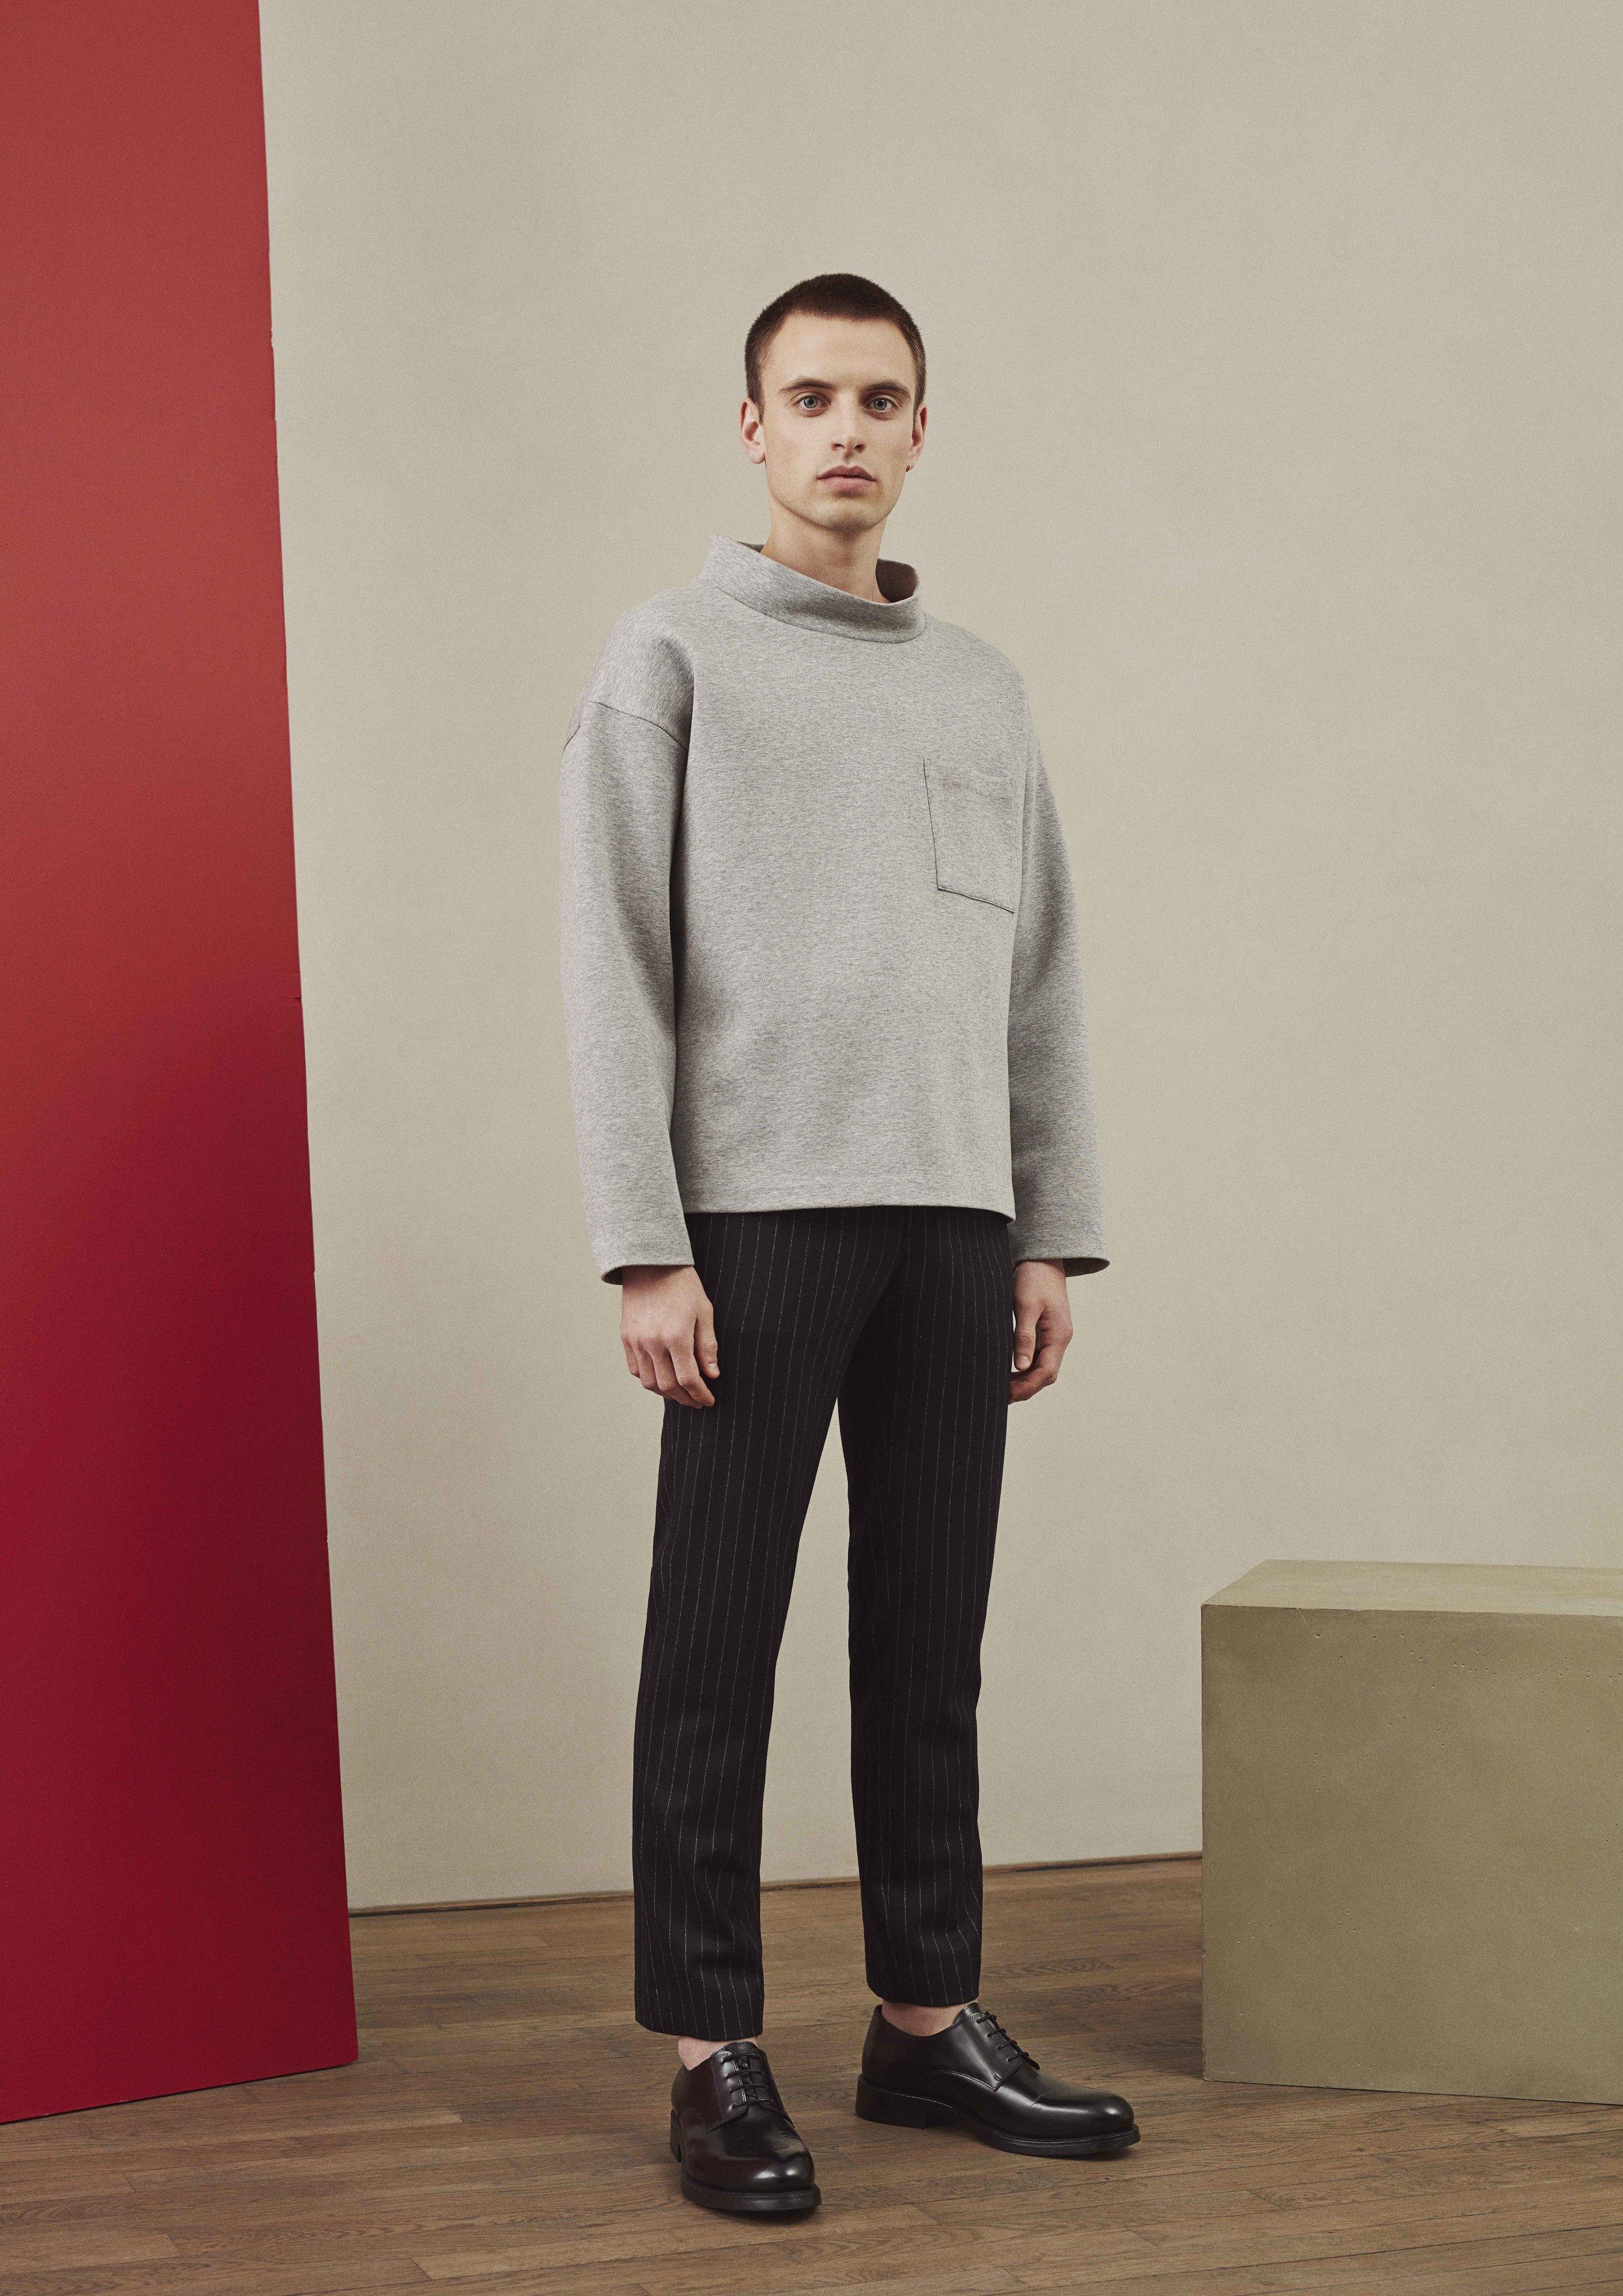 <b>2</b><br>Joachim Compact Jersey Top<br>Simon Pinstriped Wool Pants